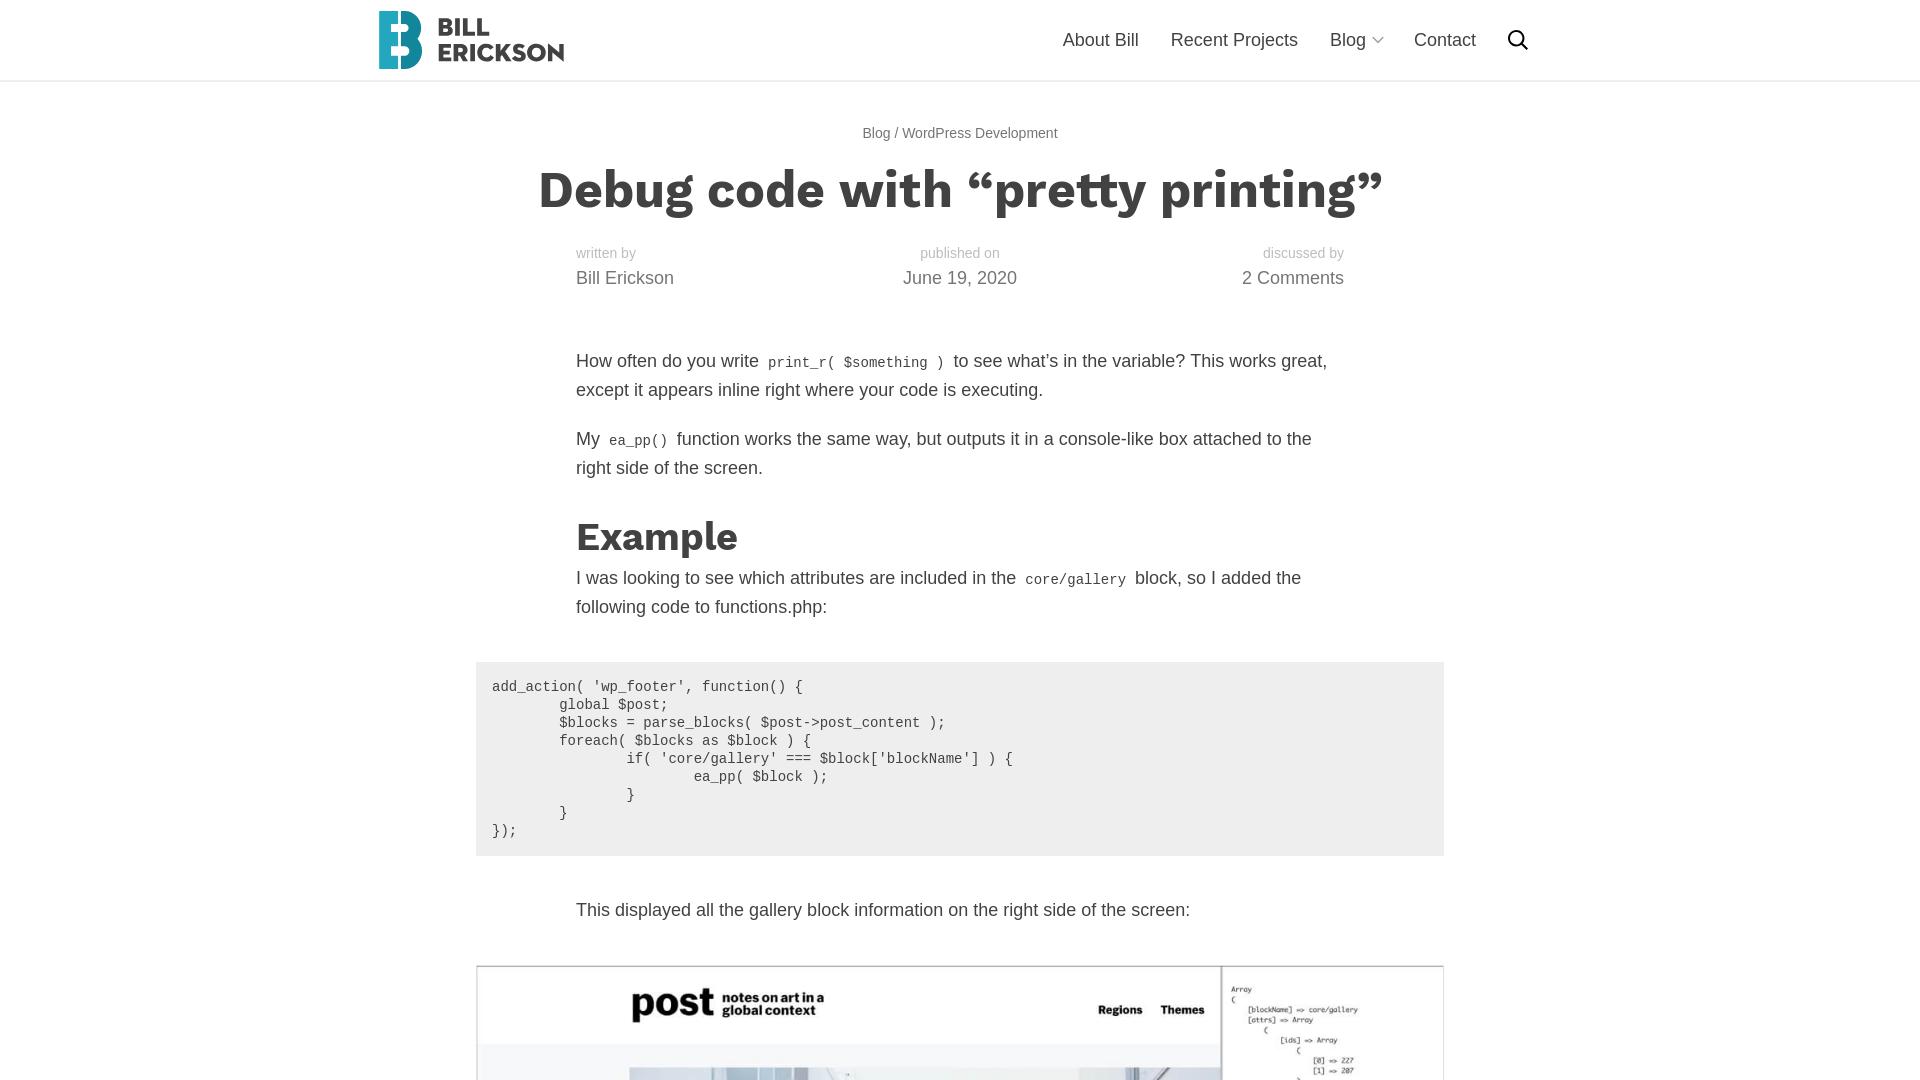 https://www.billerickson.net/debug-code-with-pretty-printing/